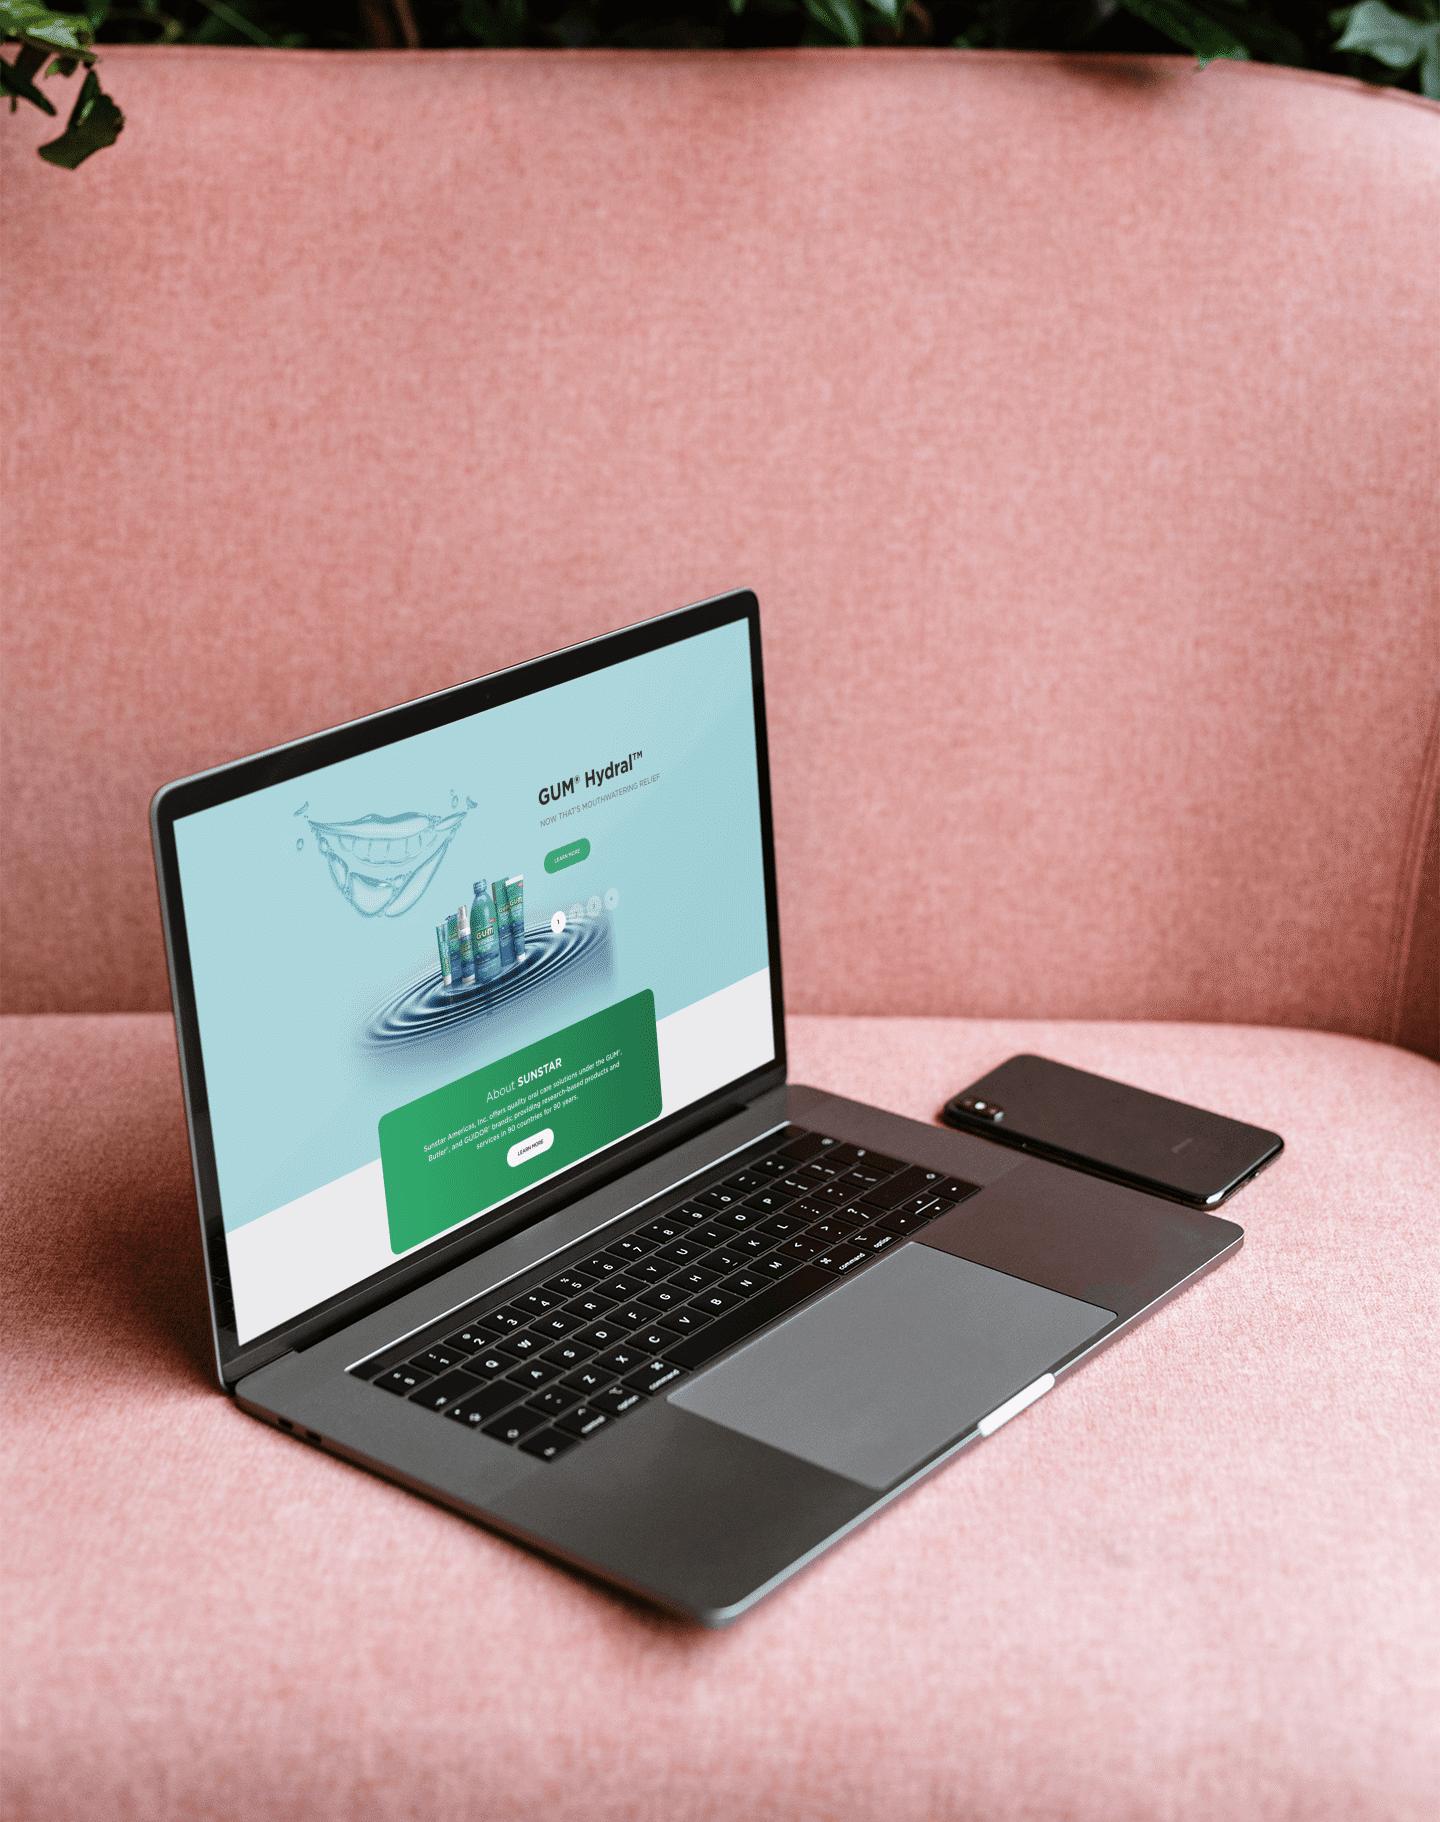 gum-website-mockup-macbook-2